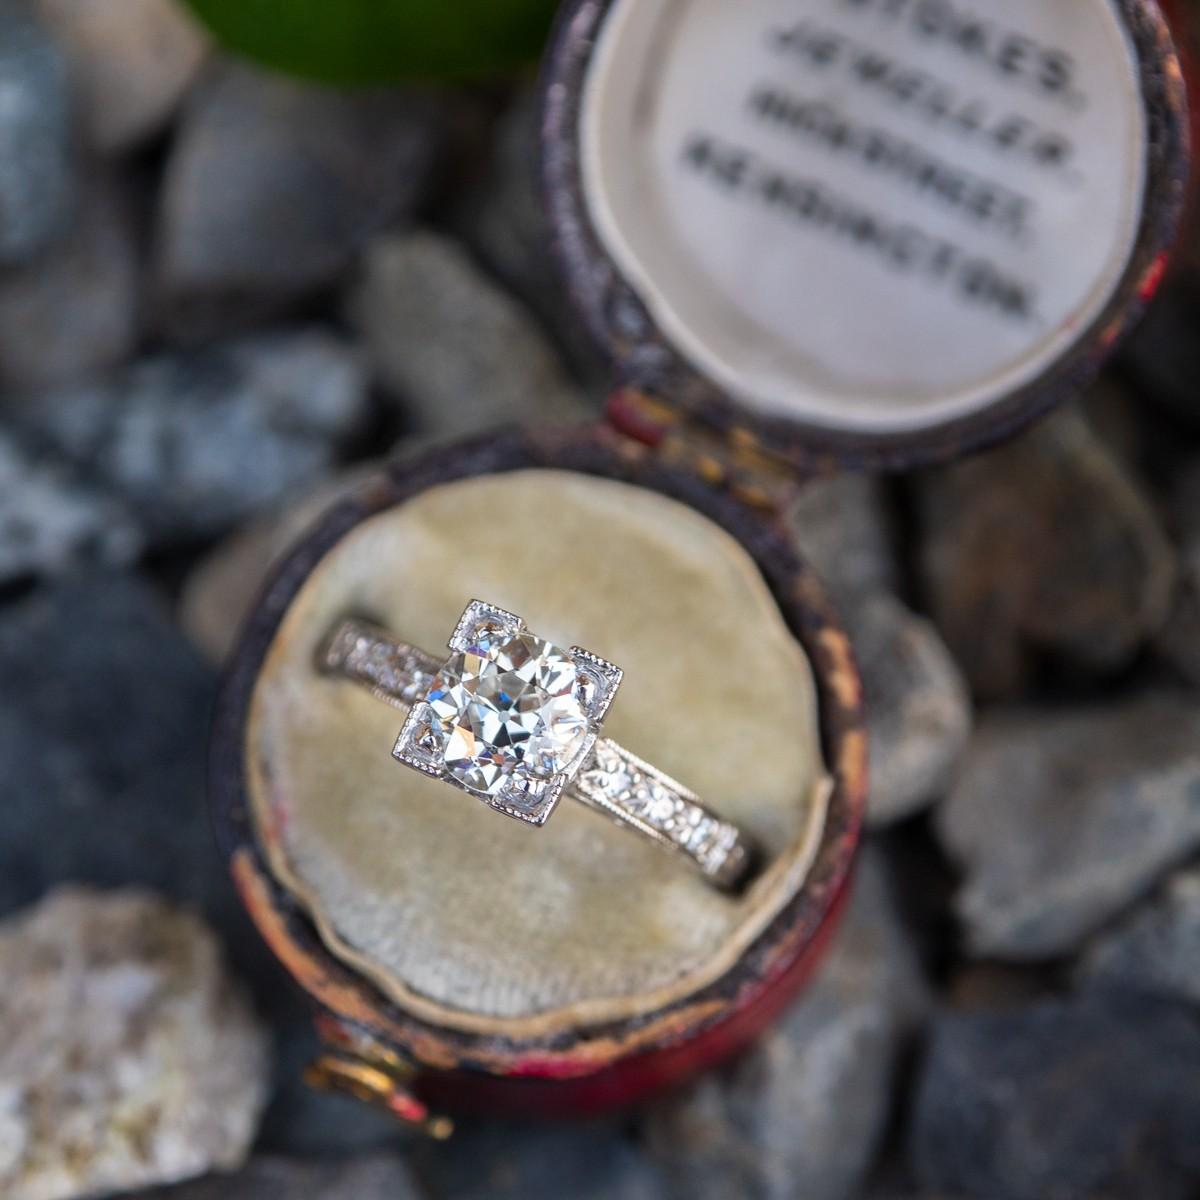 GIA Old European Cut Diamond Art Deco Engagement Ring Engraved